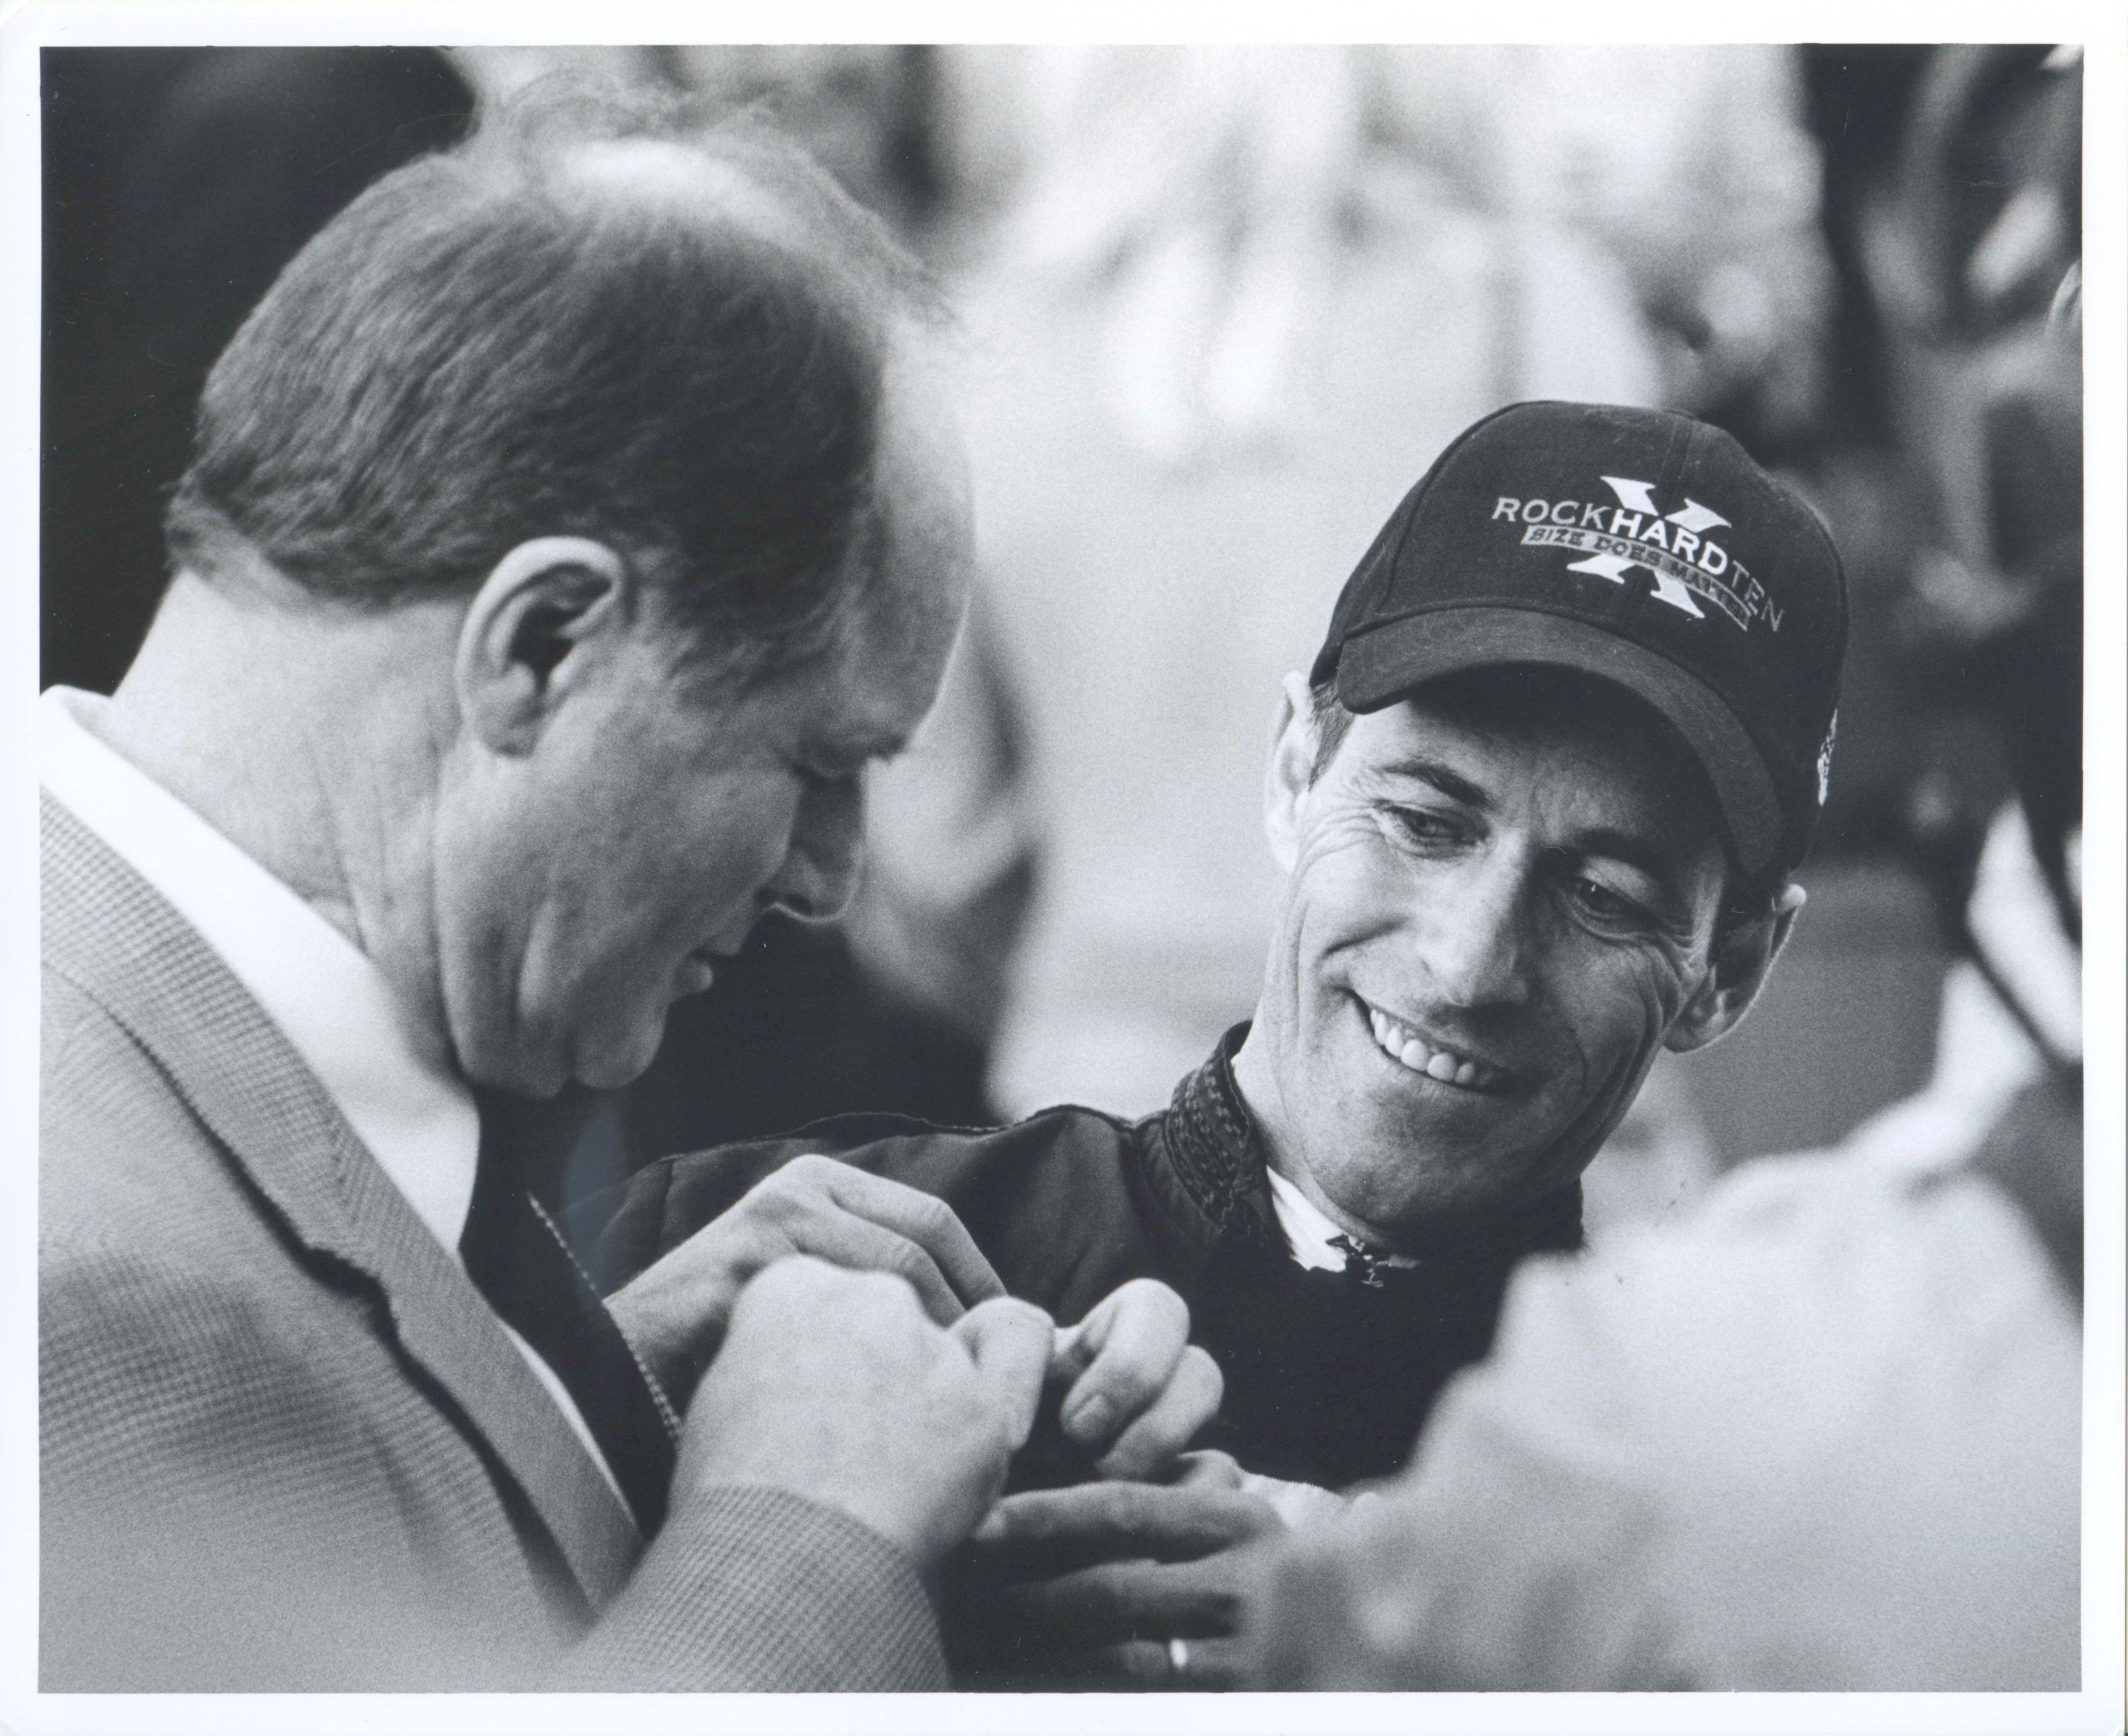 Richard Mandella and Gary Stevens after winning the 2005 Santa Anita Handicap with Rock Hard Ten (Bill Mochon/Museum Collection)